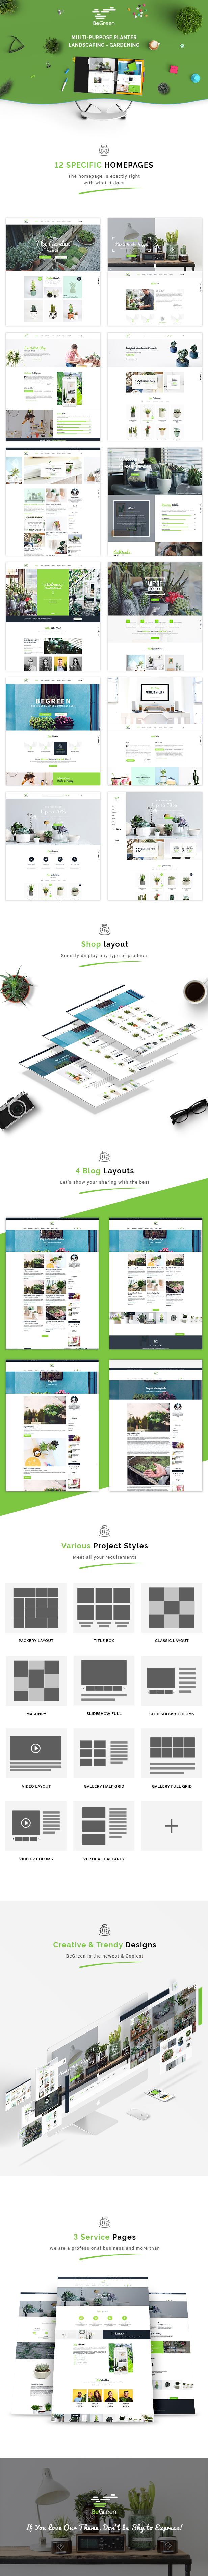 BeGreen - Multi-Purpose Template for Planter - Landscaping- Gardening - 2